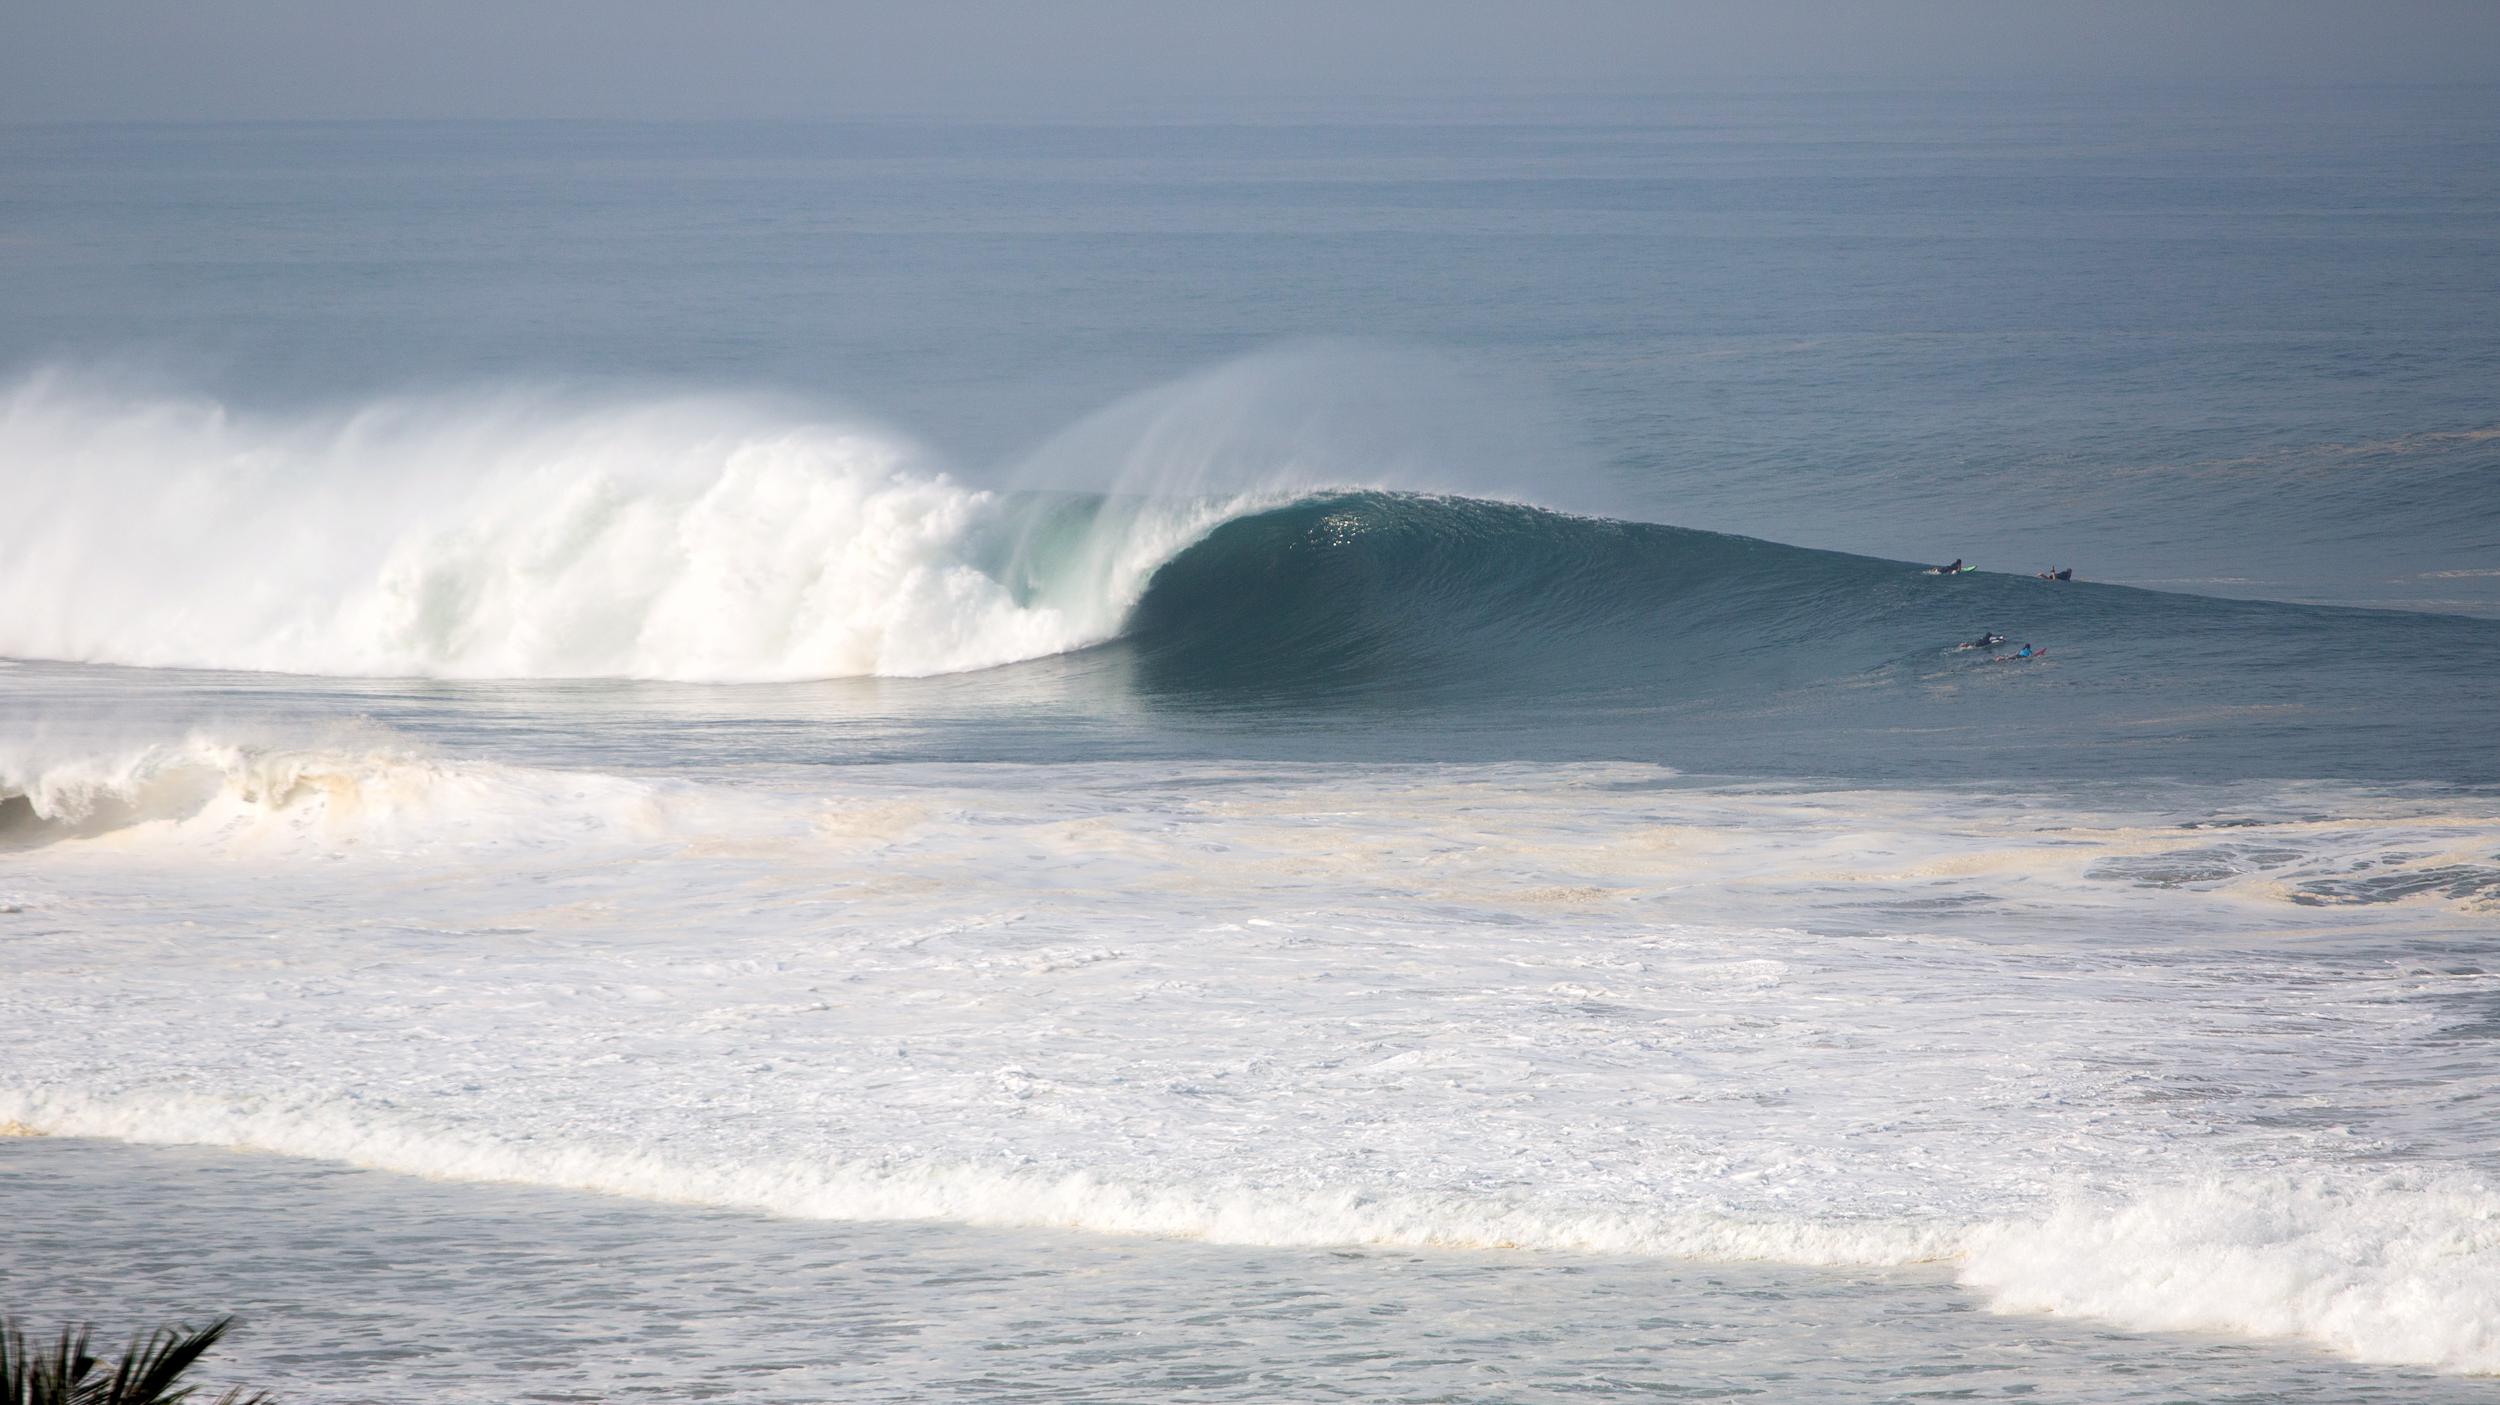 Lucano Hinkle, Puerto Escondido, Good to Epic, Surfline,